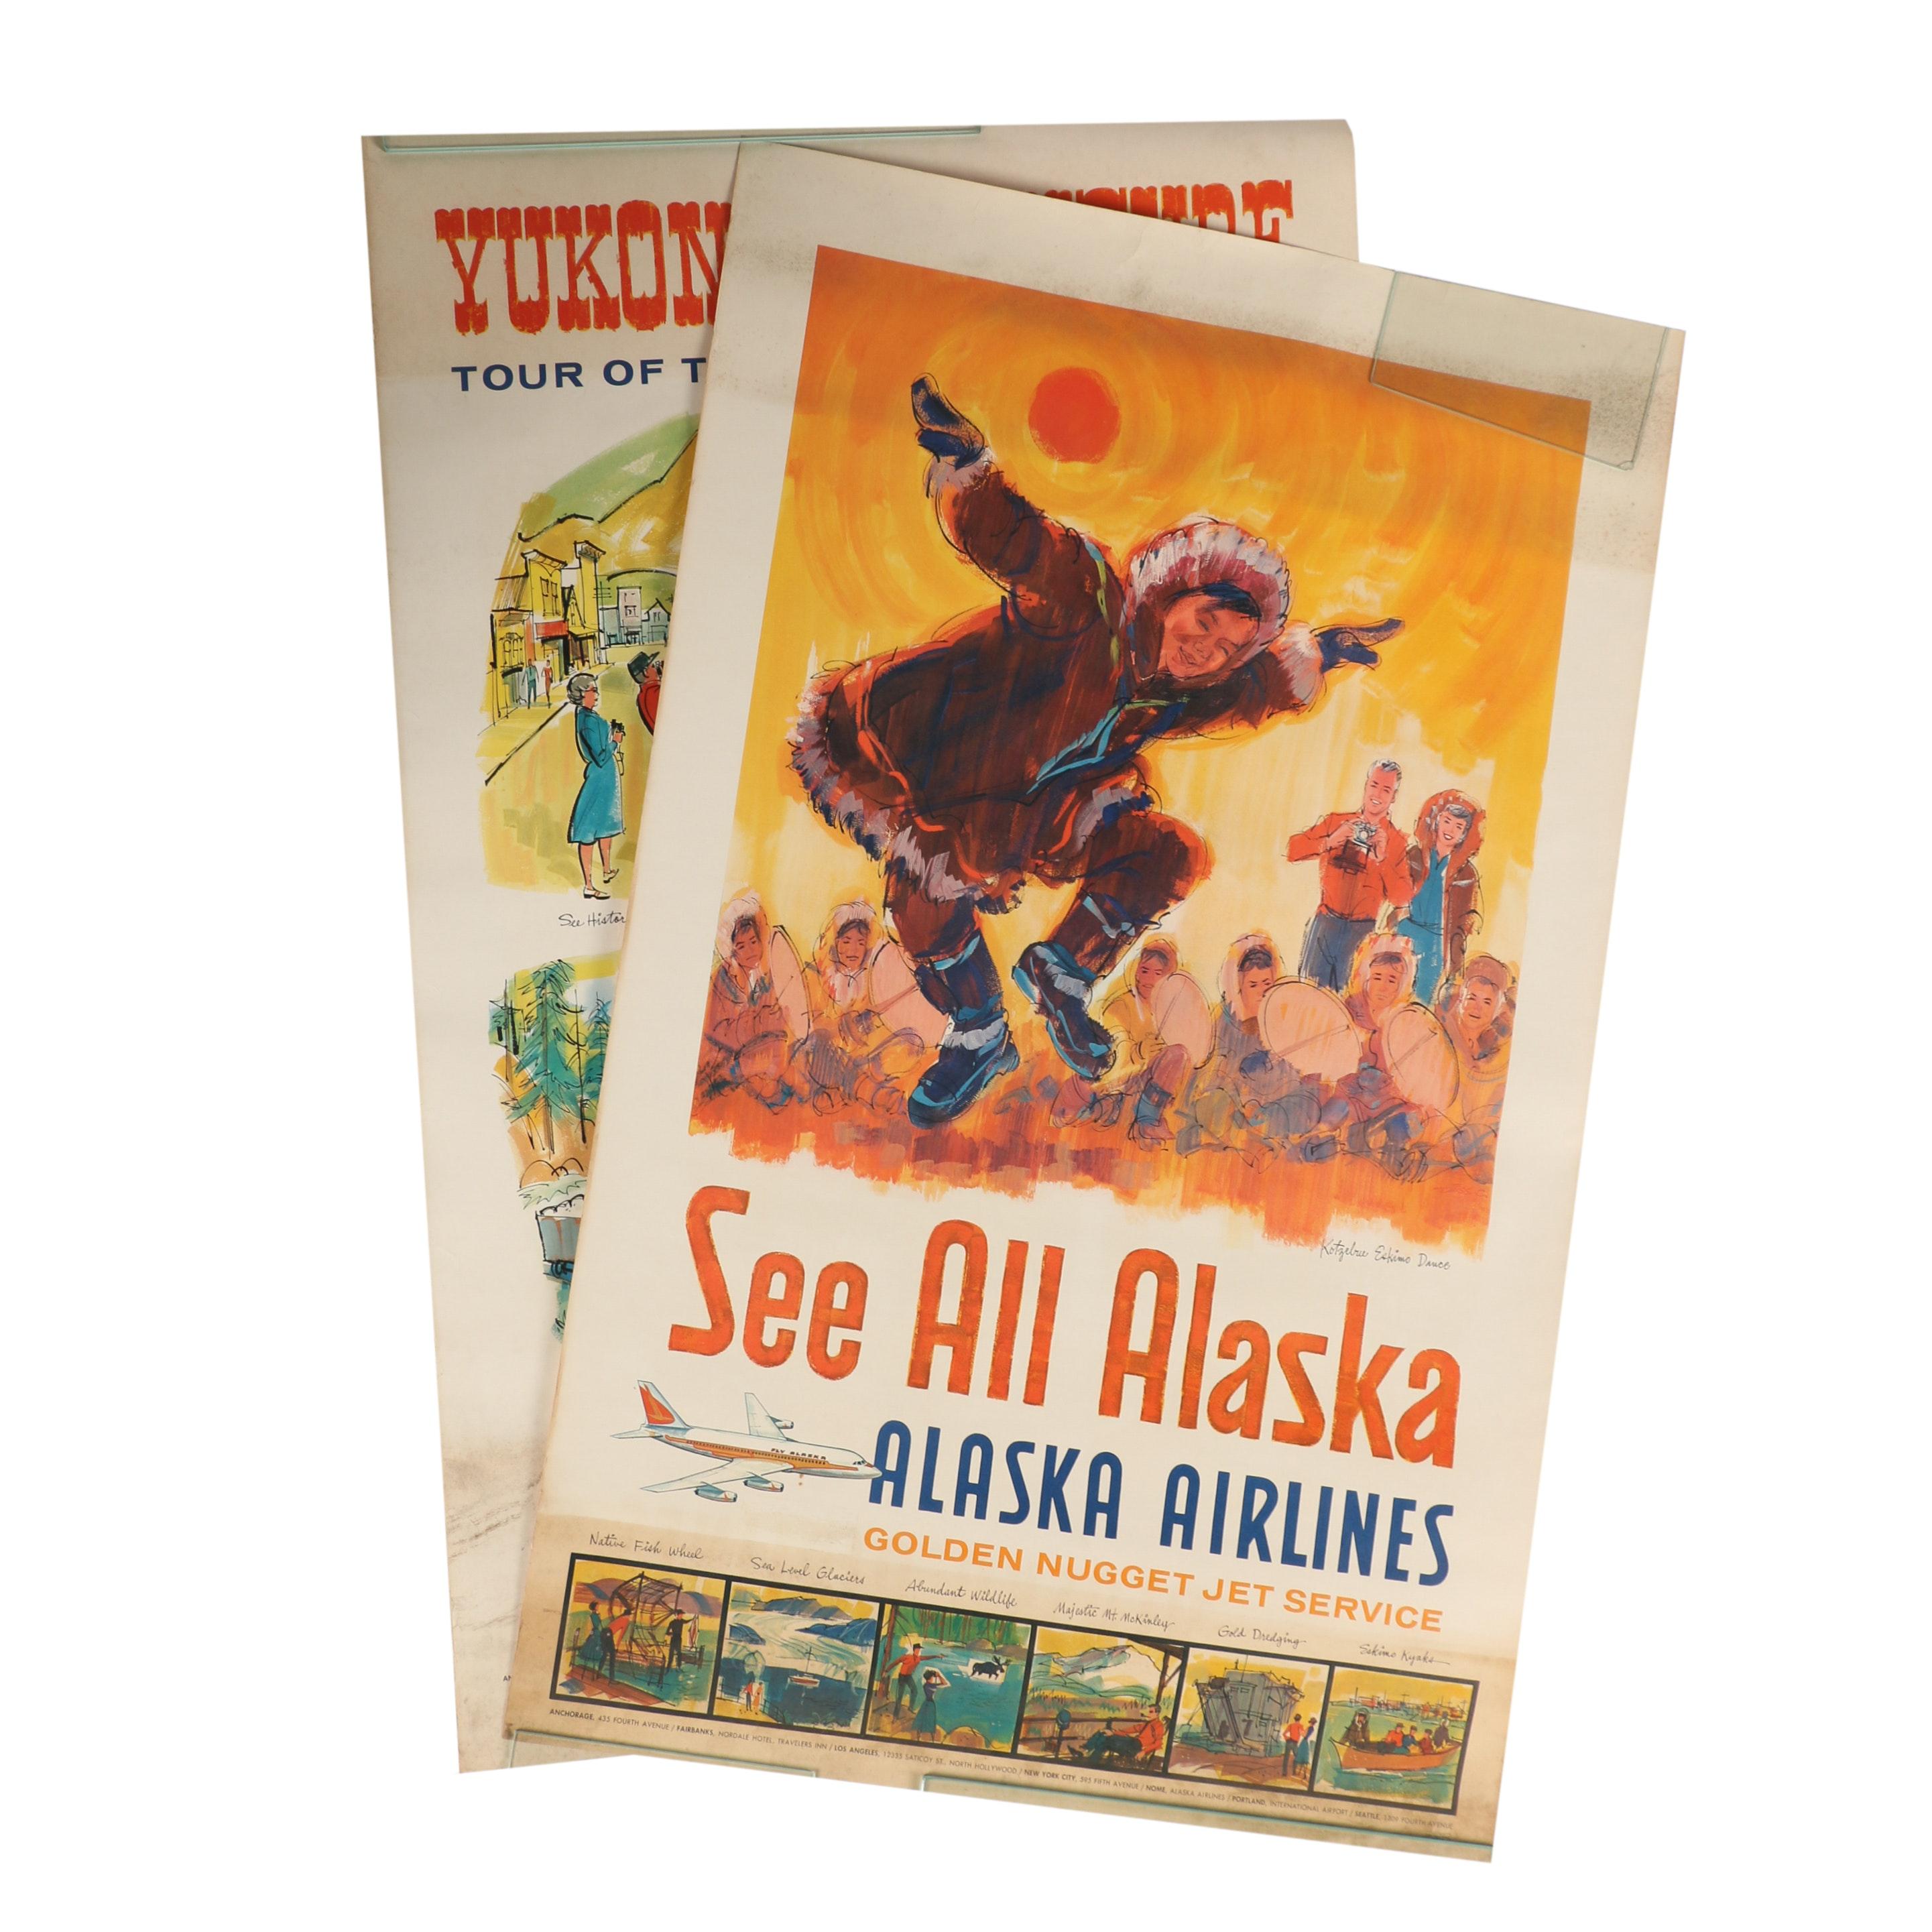 Vintage Offset Lithographs of Alaska Airlines Promotional Travel Posters